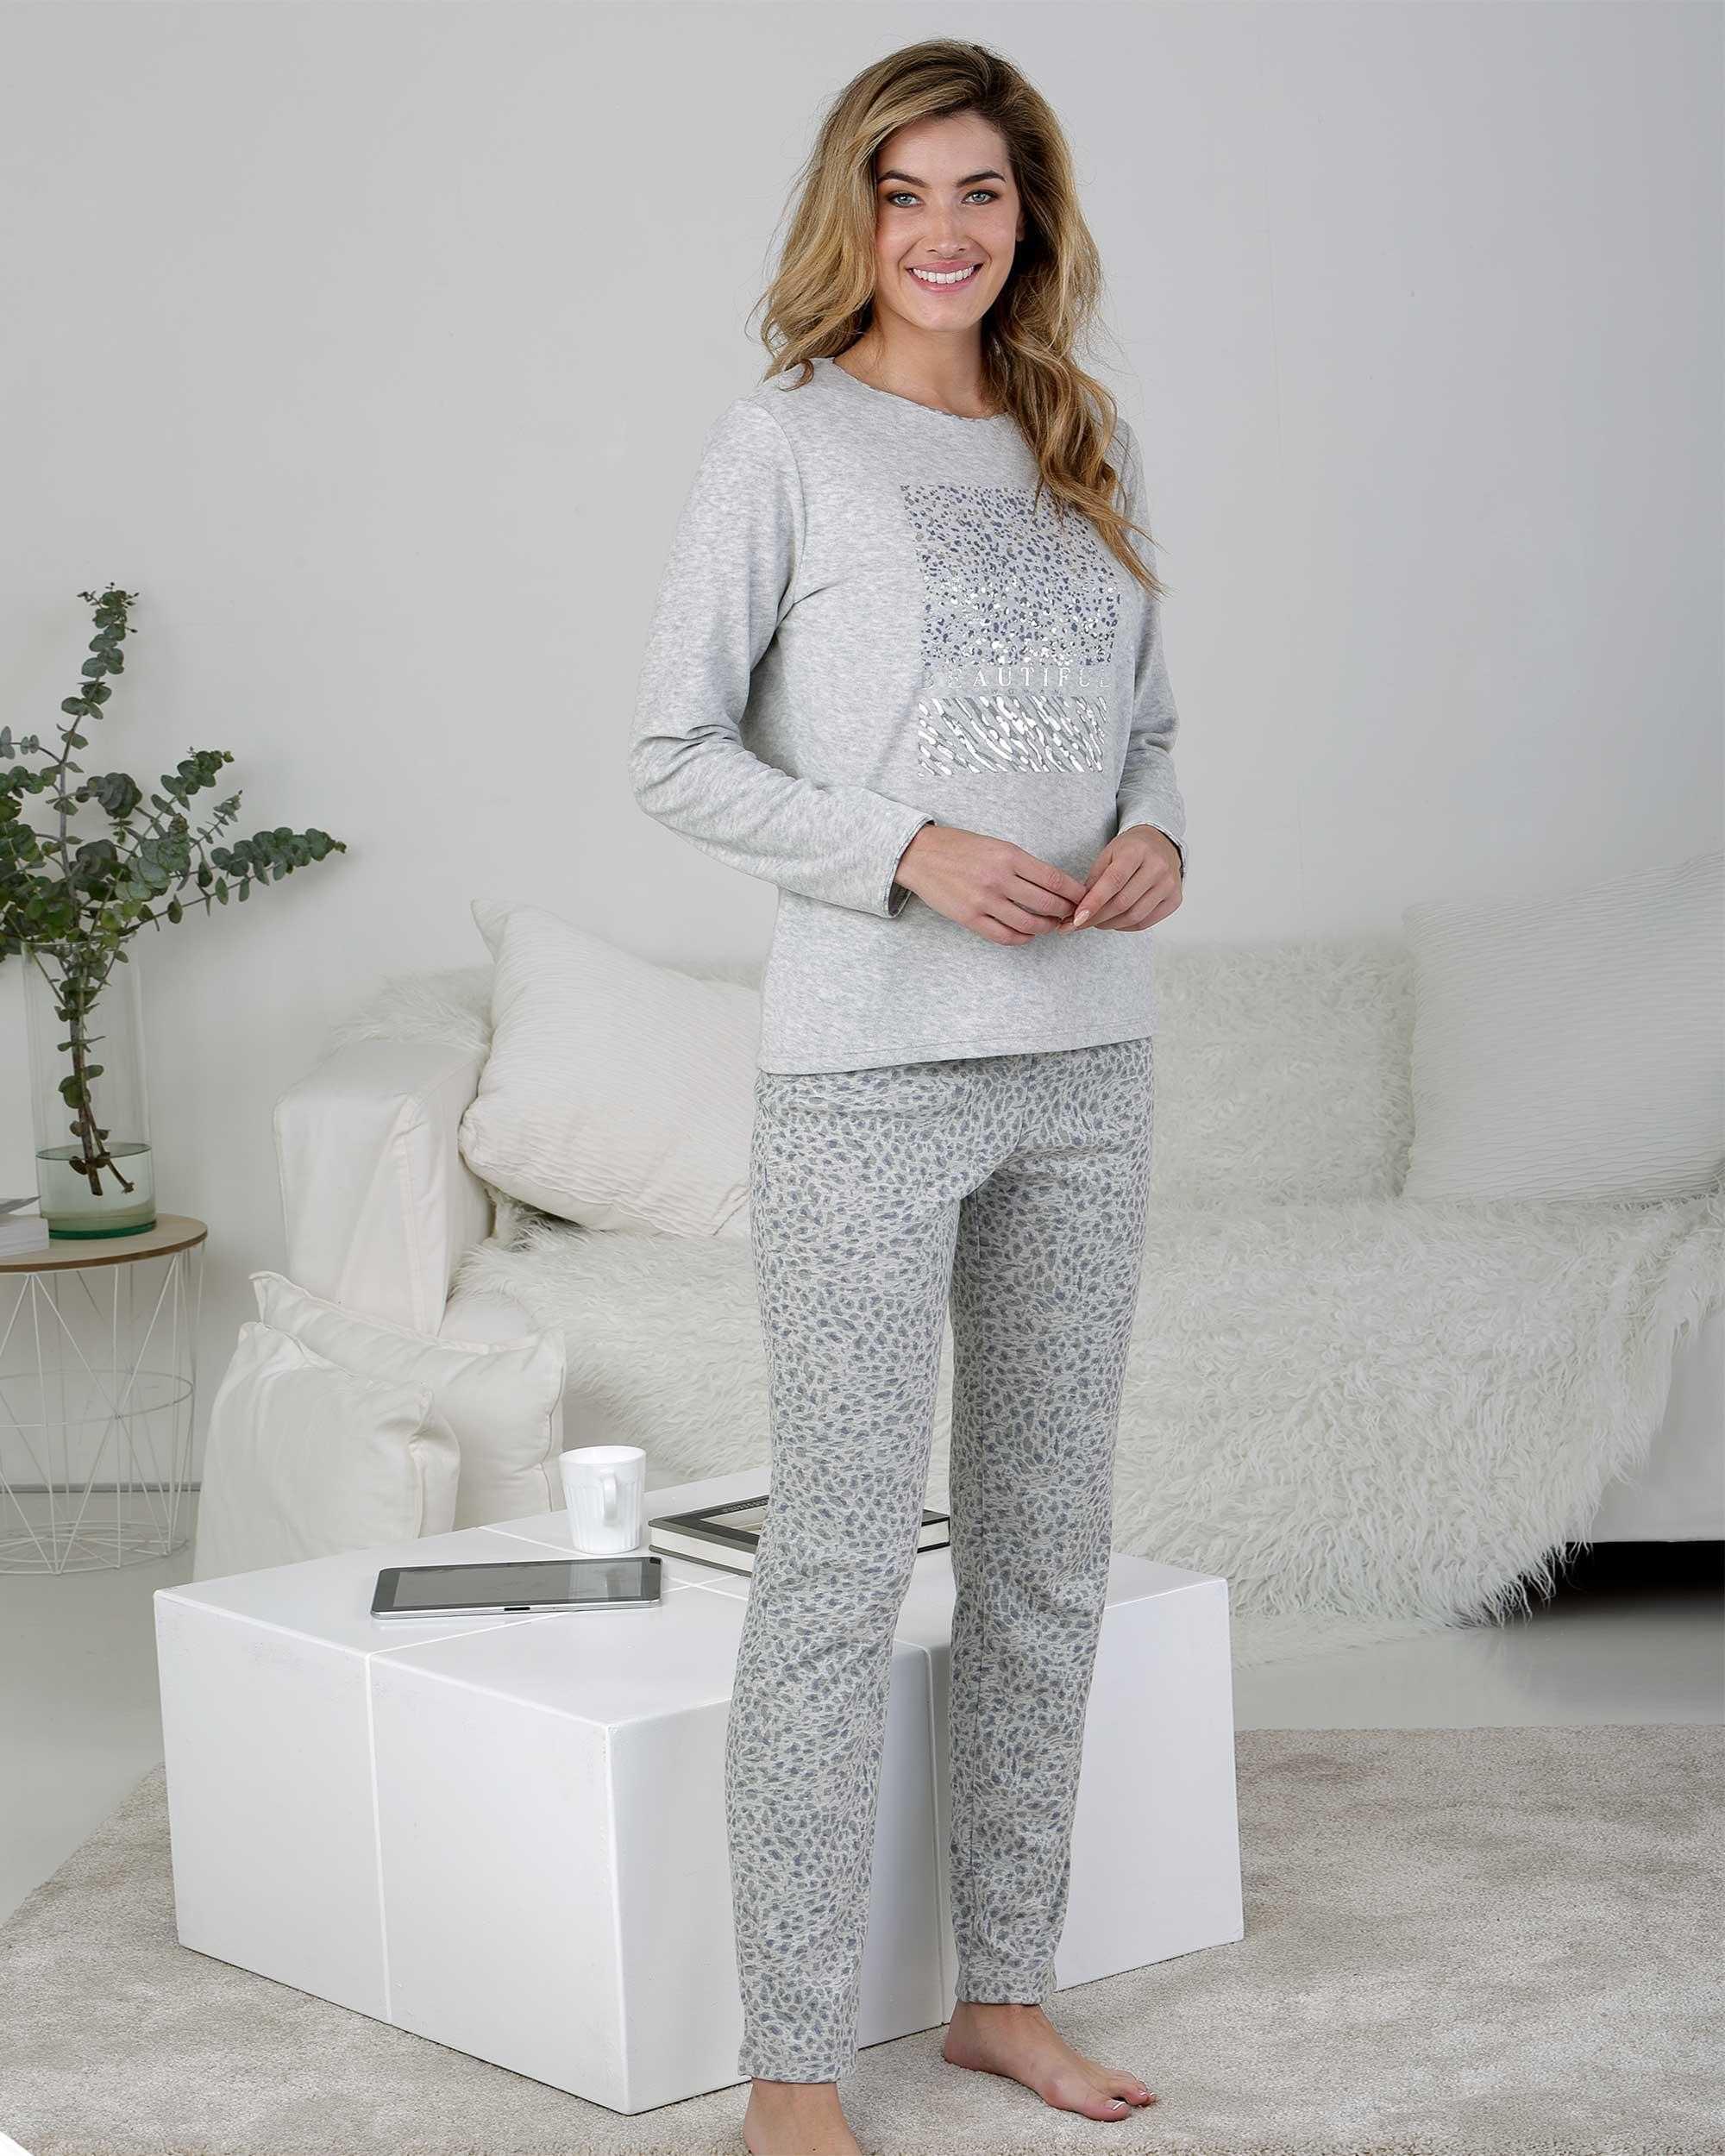 Pijama Señora Terciopelo Animal Print Massana COLOR: gris; TALLAS: l, xl  - Lencería noche  - PEPI GUERRA